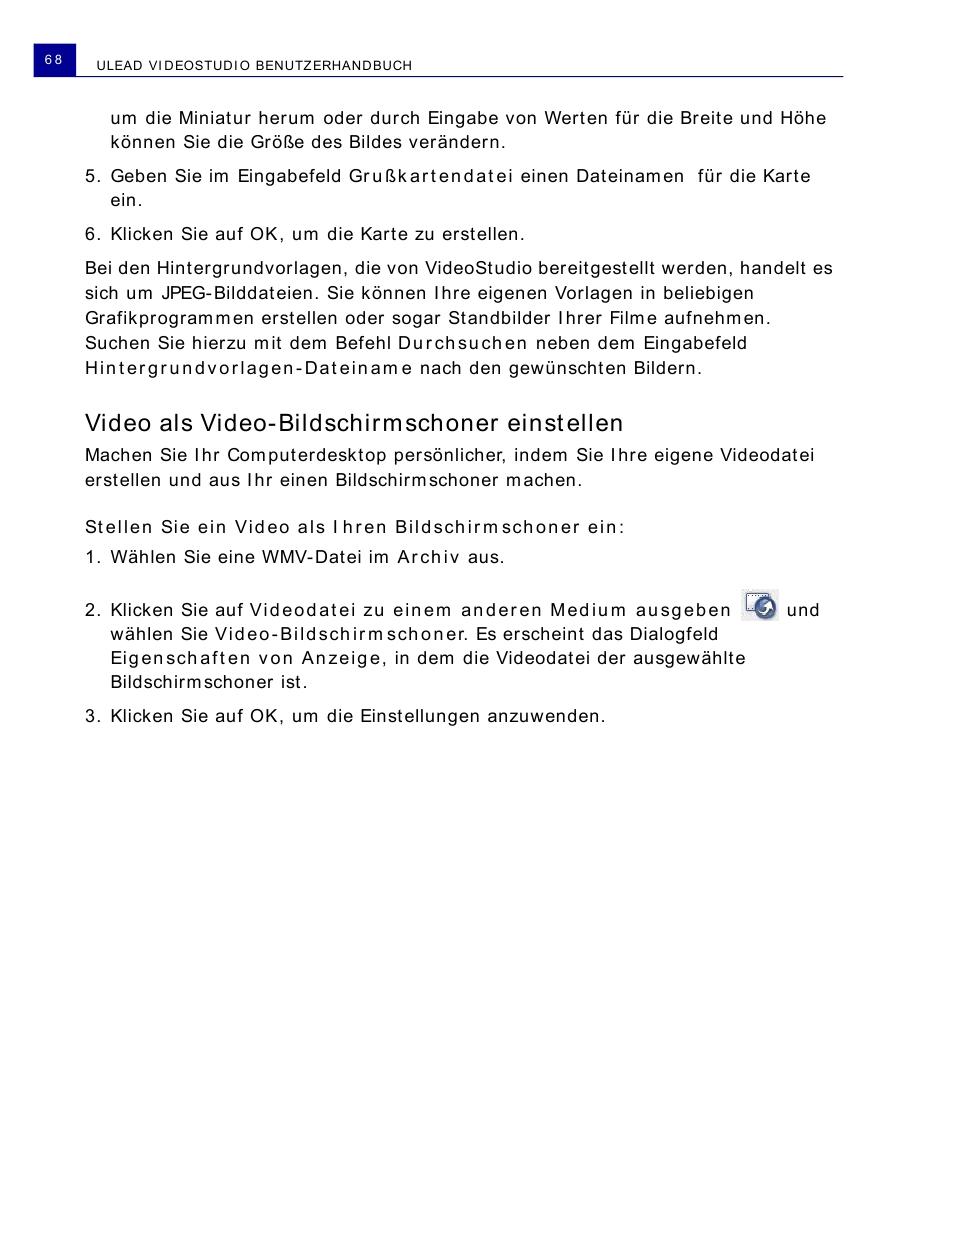 Schön Machen Mathe Arbeitsblatt Bilder - Mathe Arbeitsblatt ...